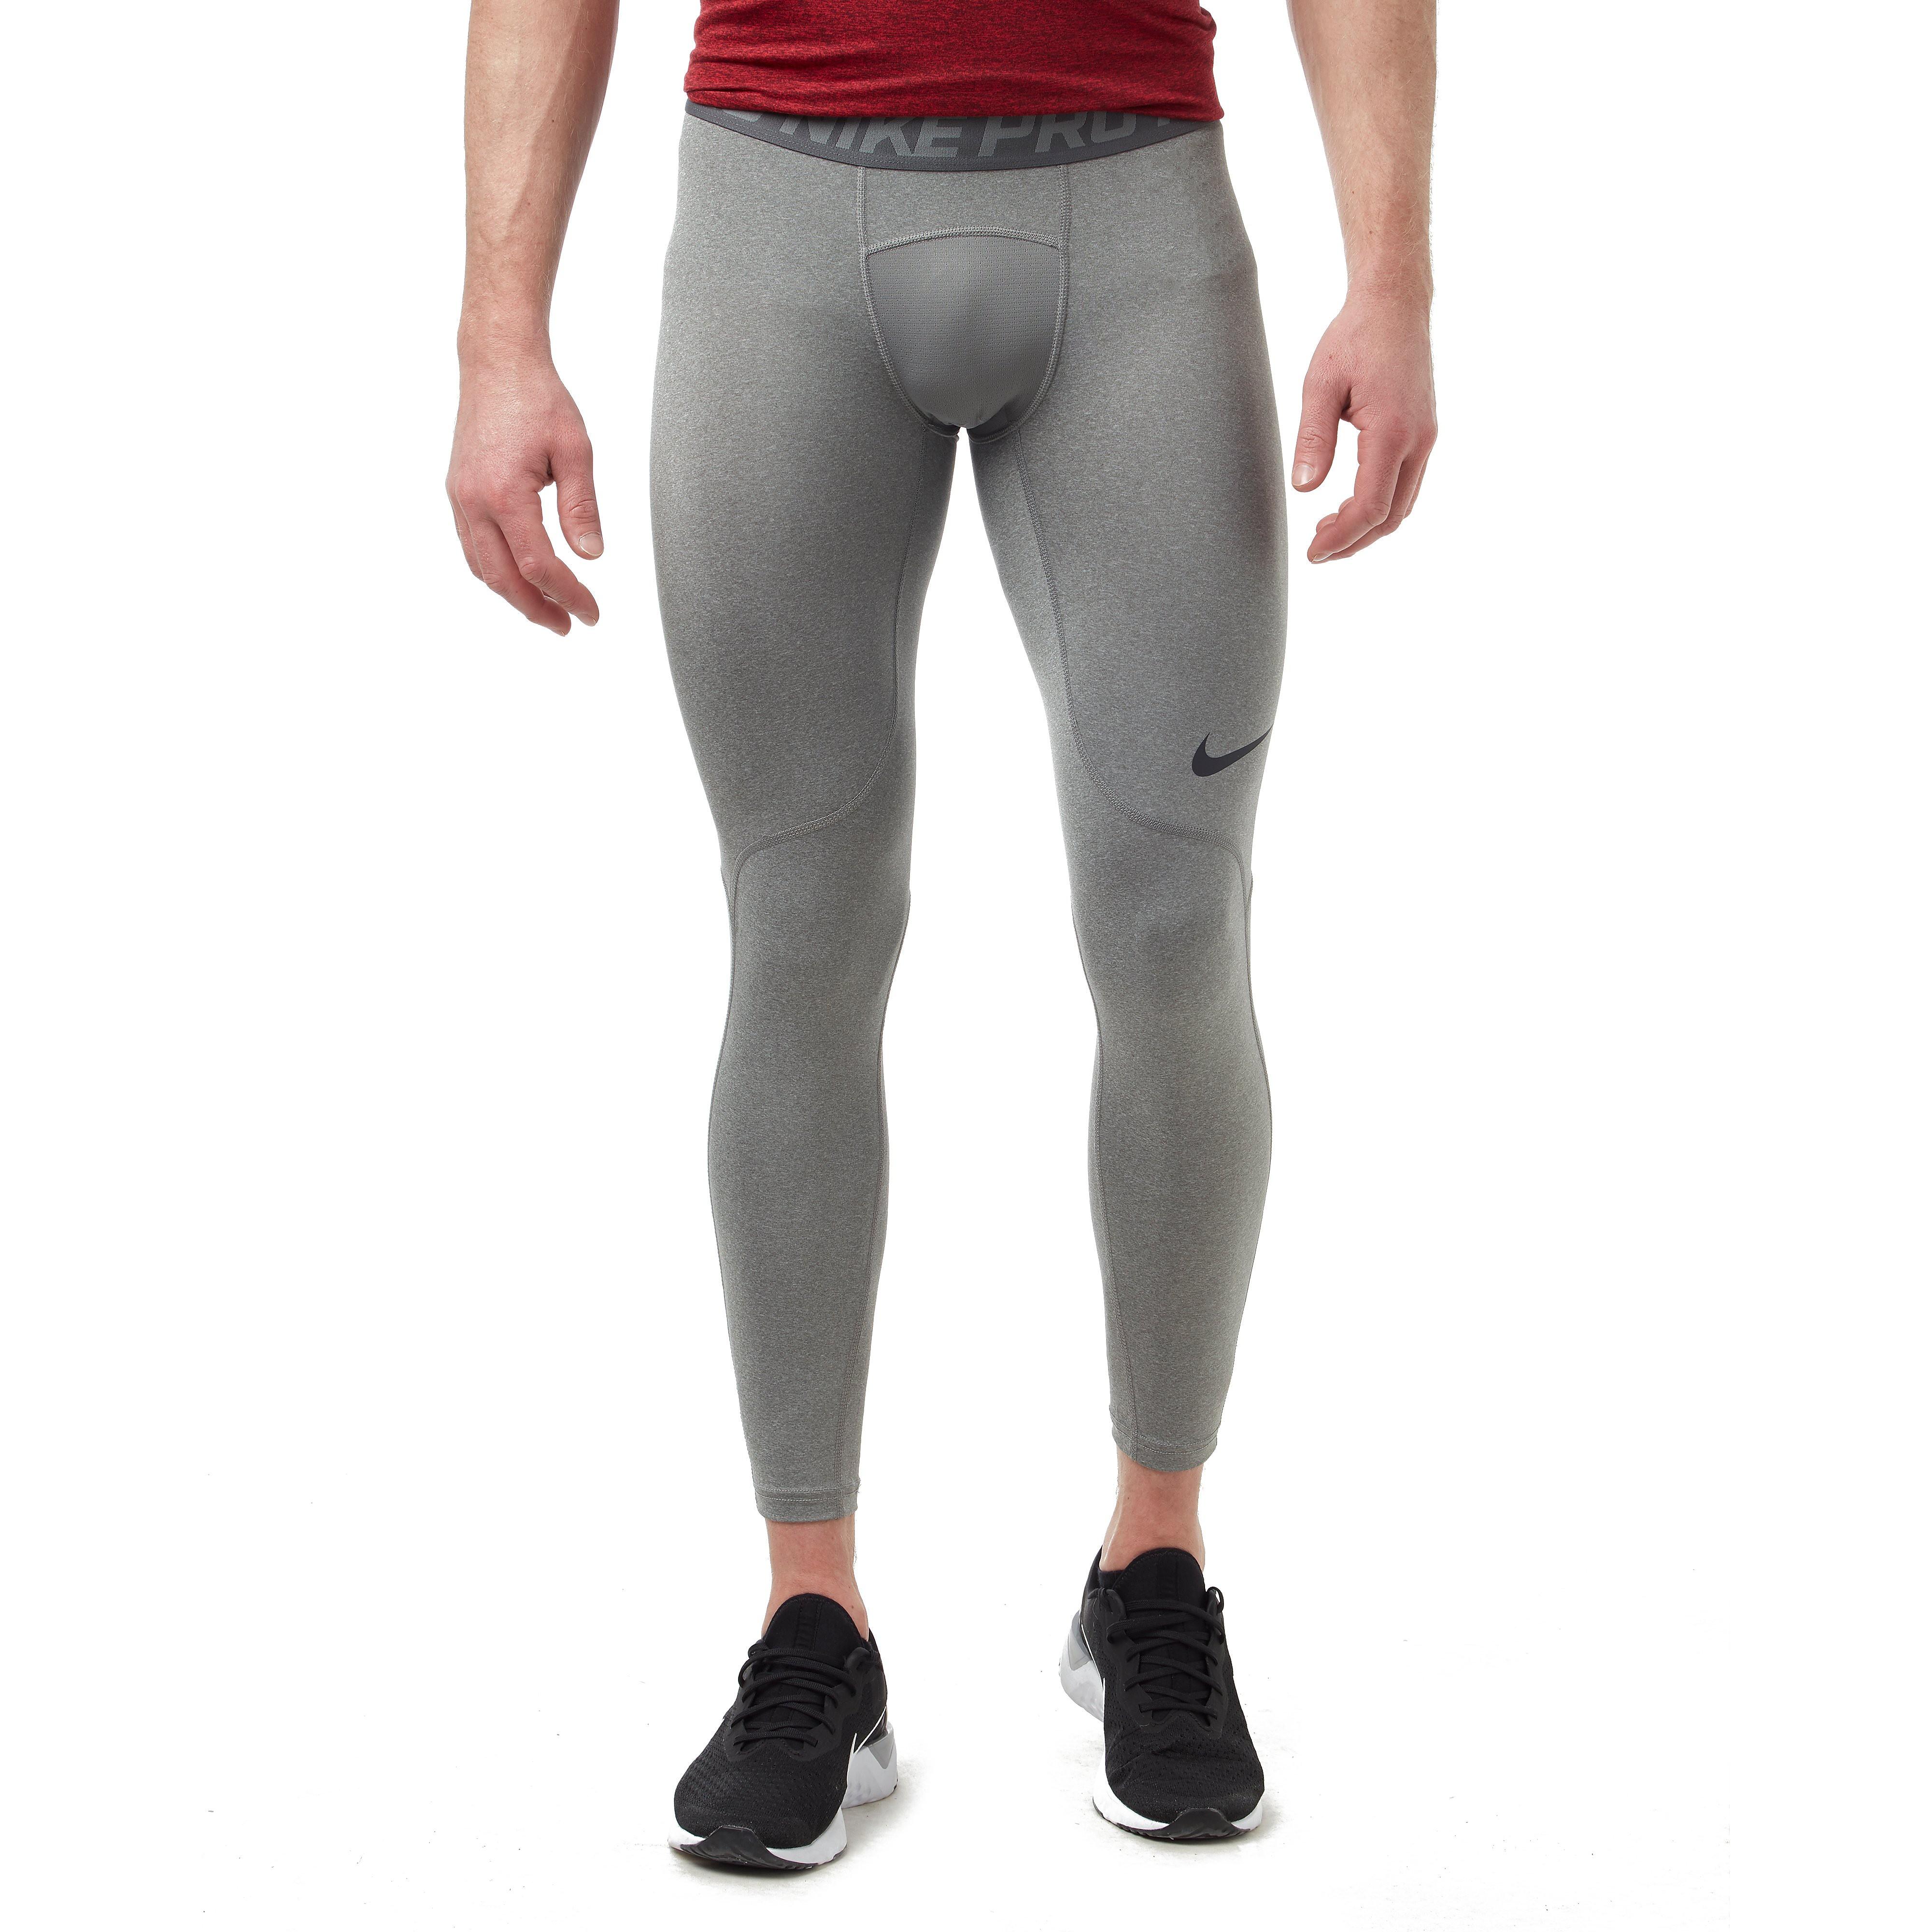 Nike Pro Compression Men's Training Tights